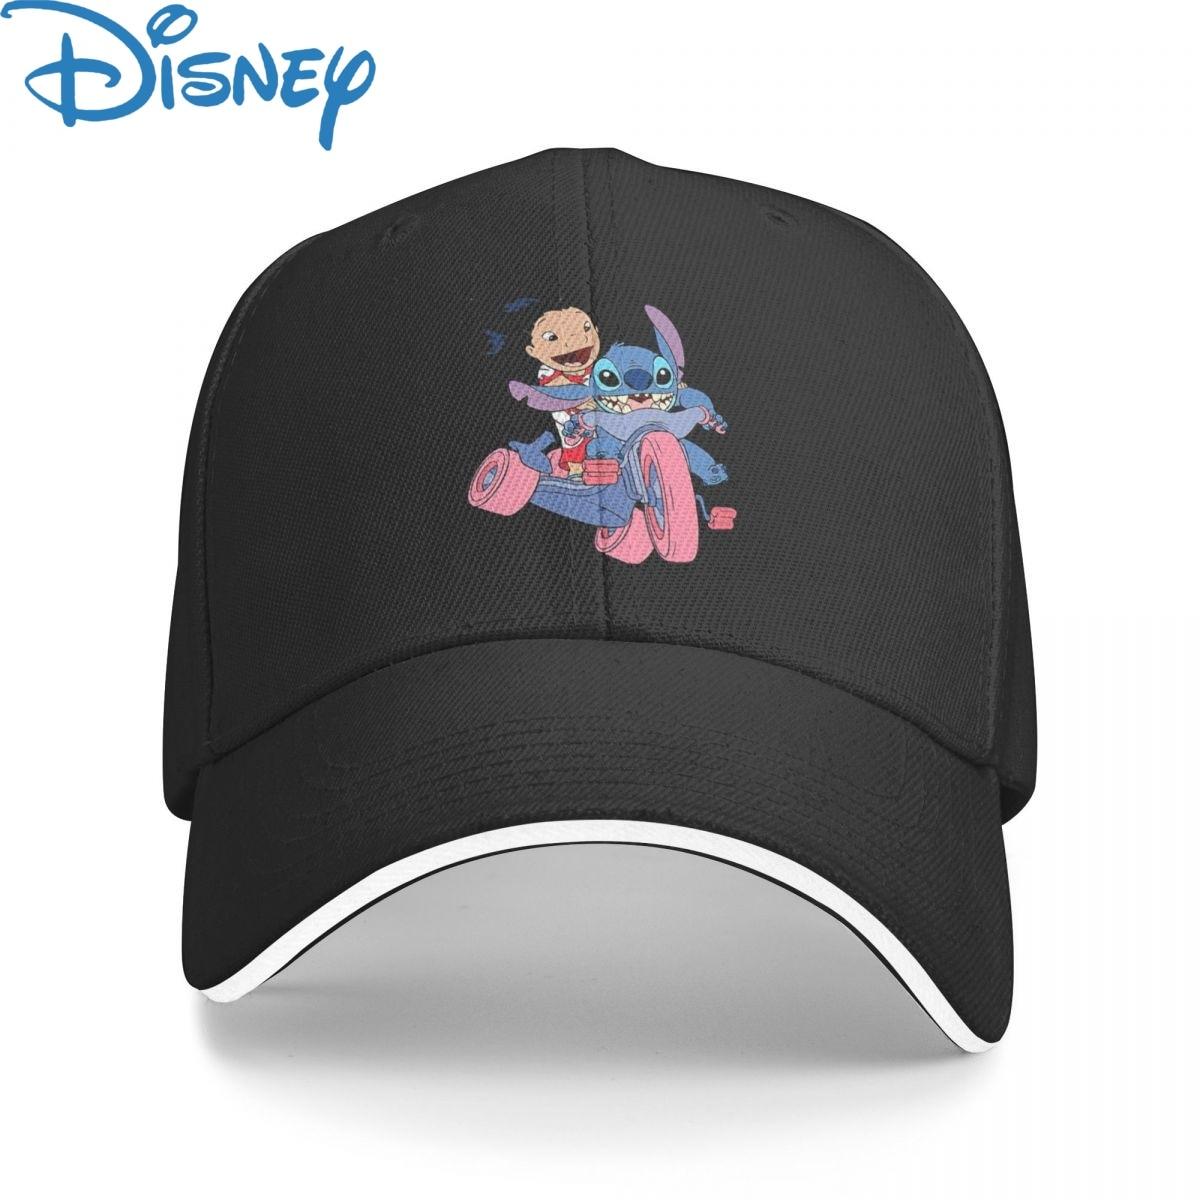 Disney Stitch Lilo (8) Baseball Cap Men Women Hip Hop Dad Sun Hat Trucker Hat